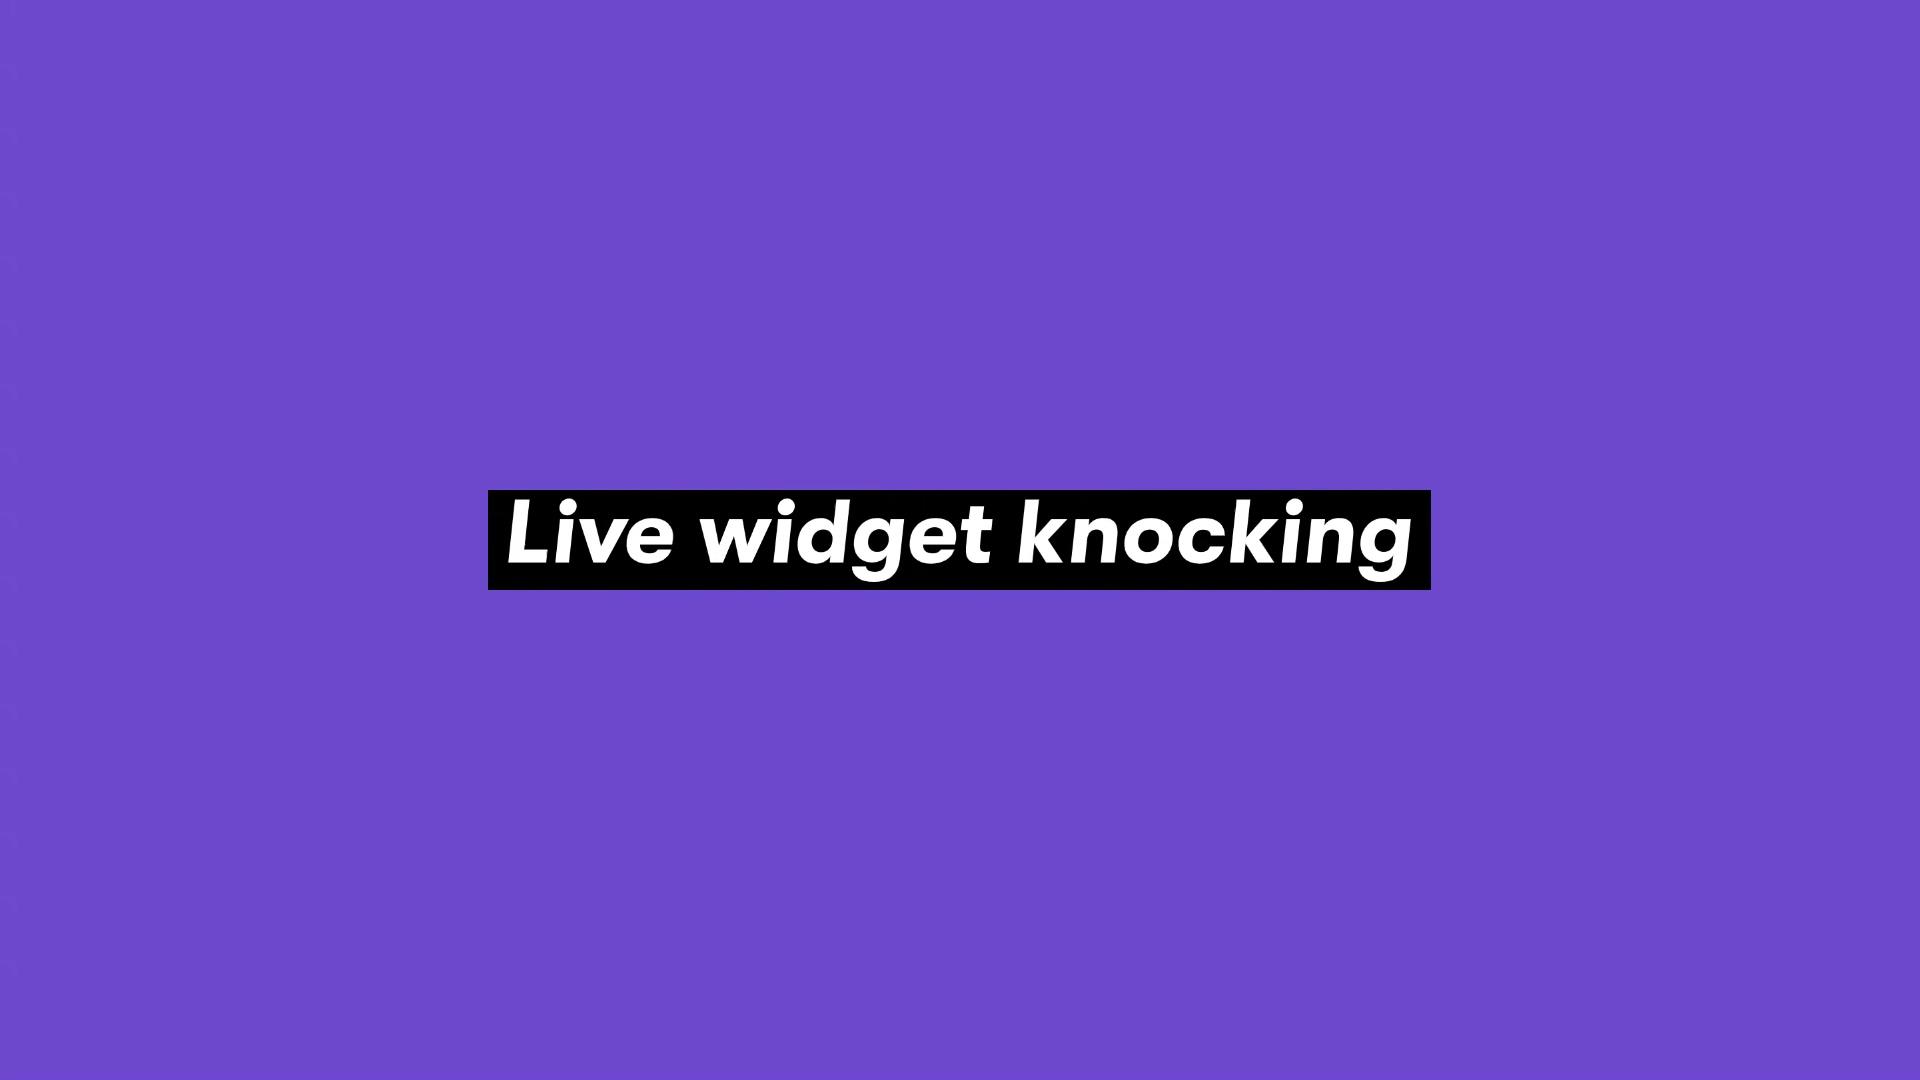 Live_widget_Knocking-2